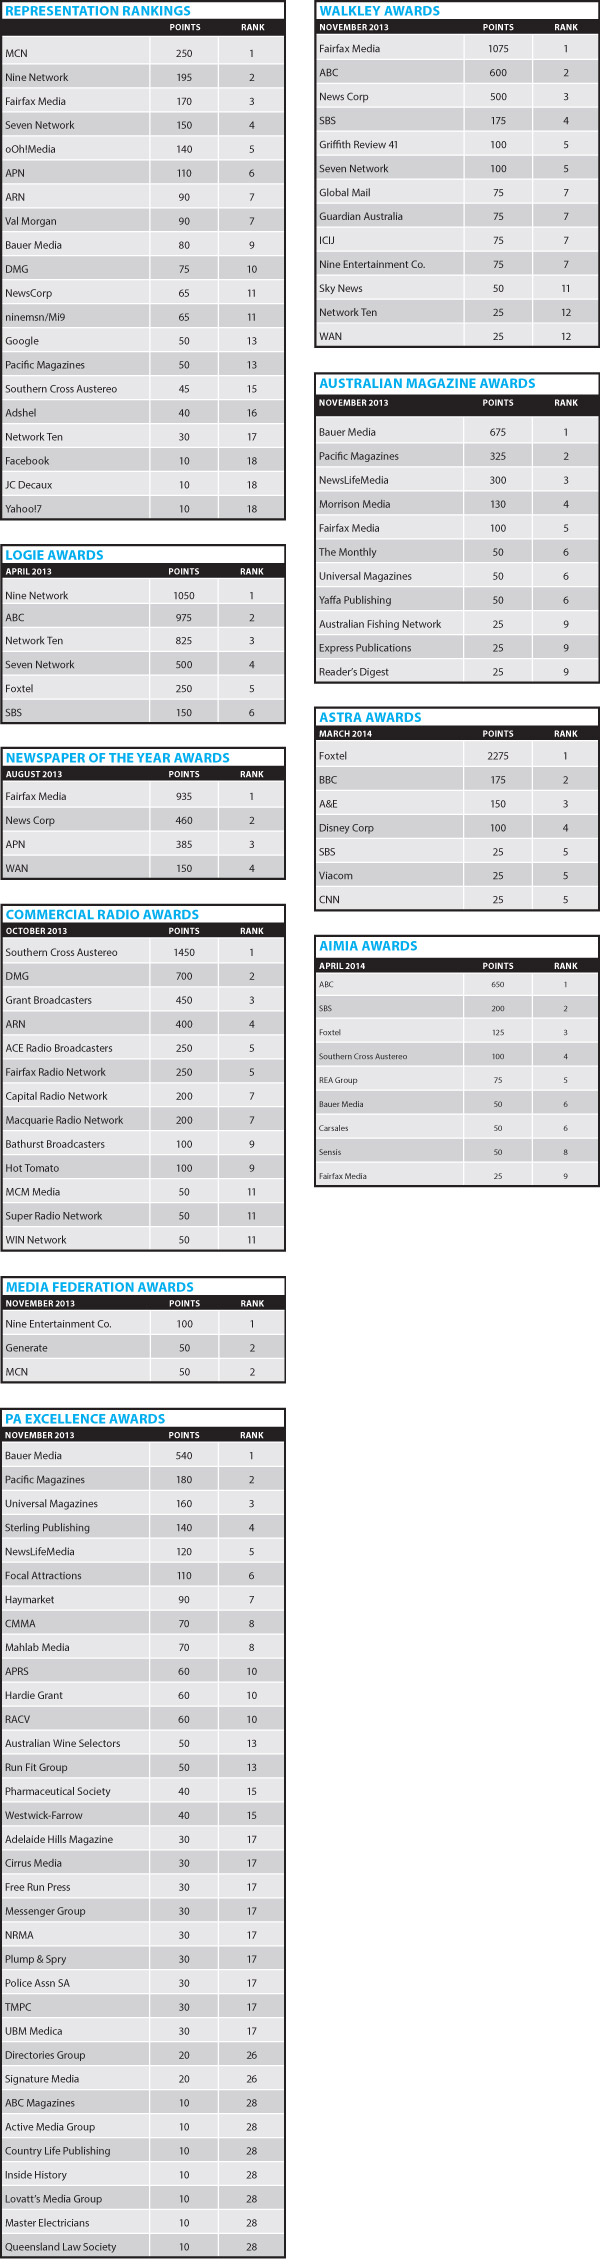 Media Companies Representation Rankings